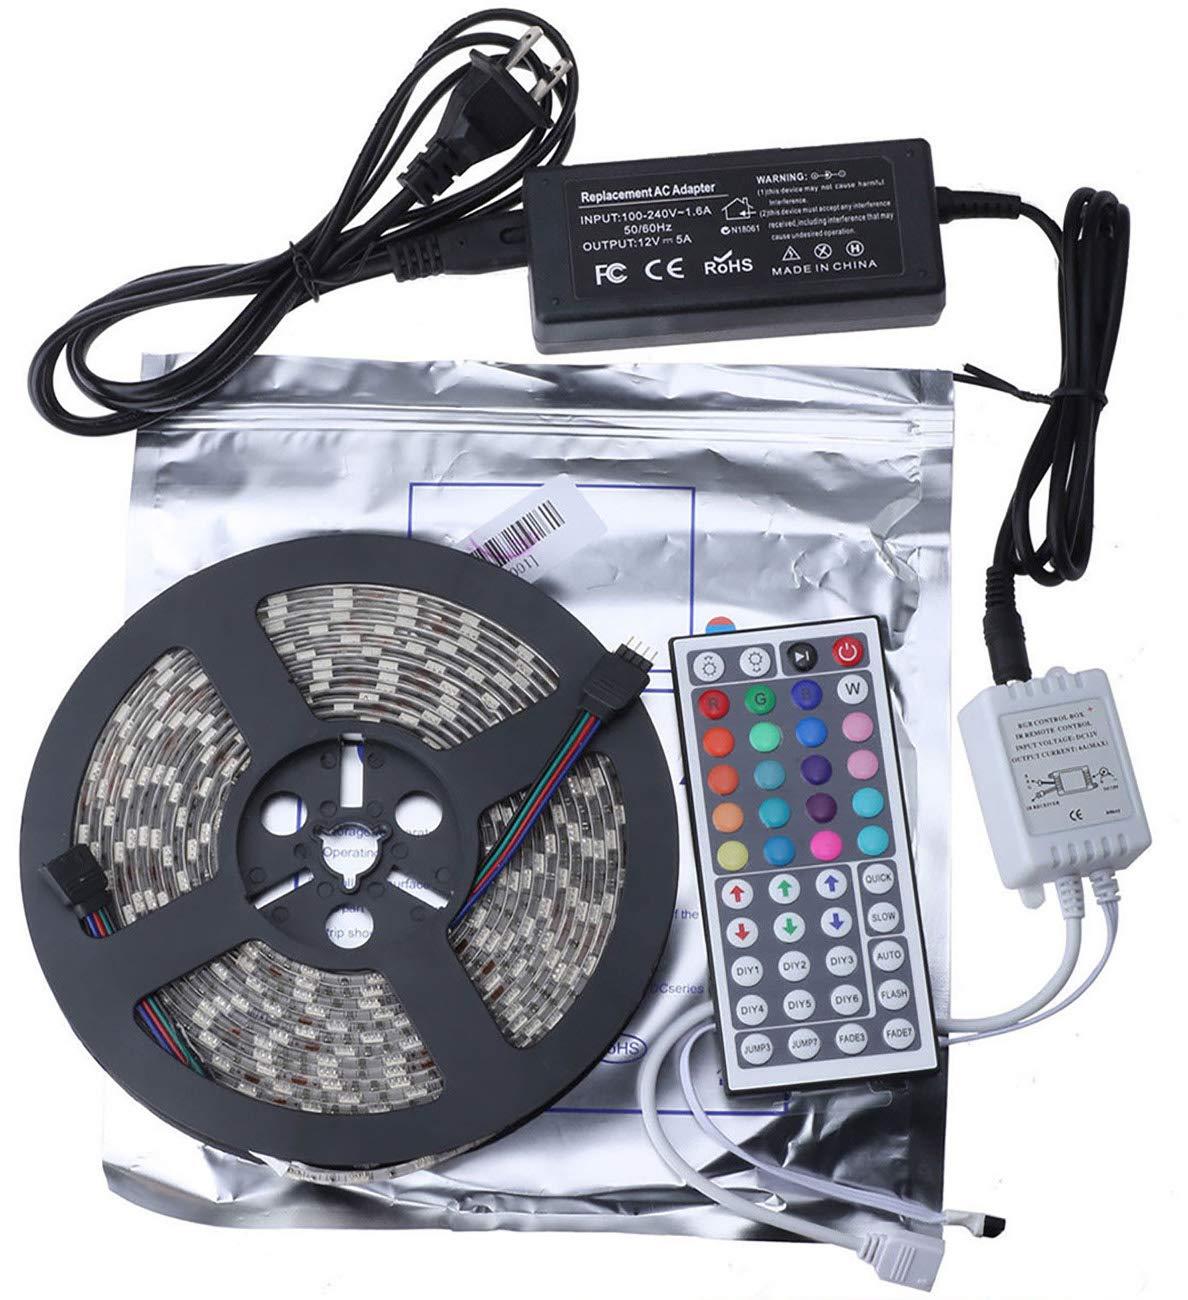 INIEIWO 2pcs 5M 16.4ft 5050 RGB SMD Led Strip Lights Kit 300LED Waterproof IP65+44Key Remote+power supply